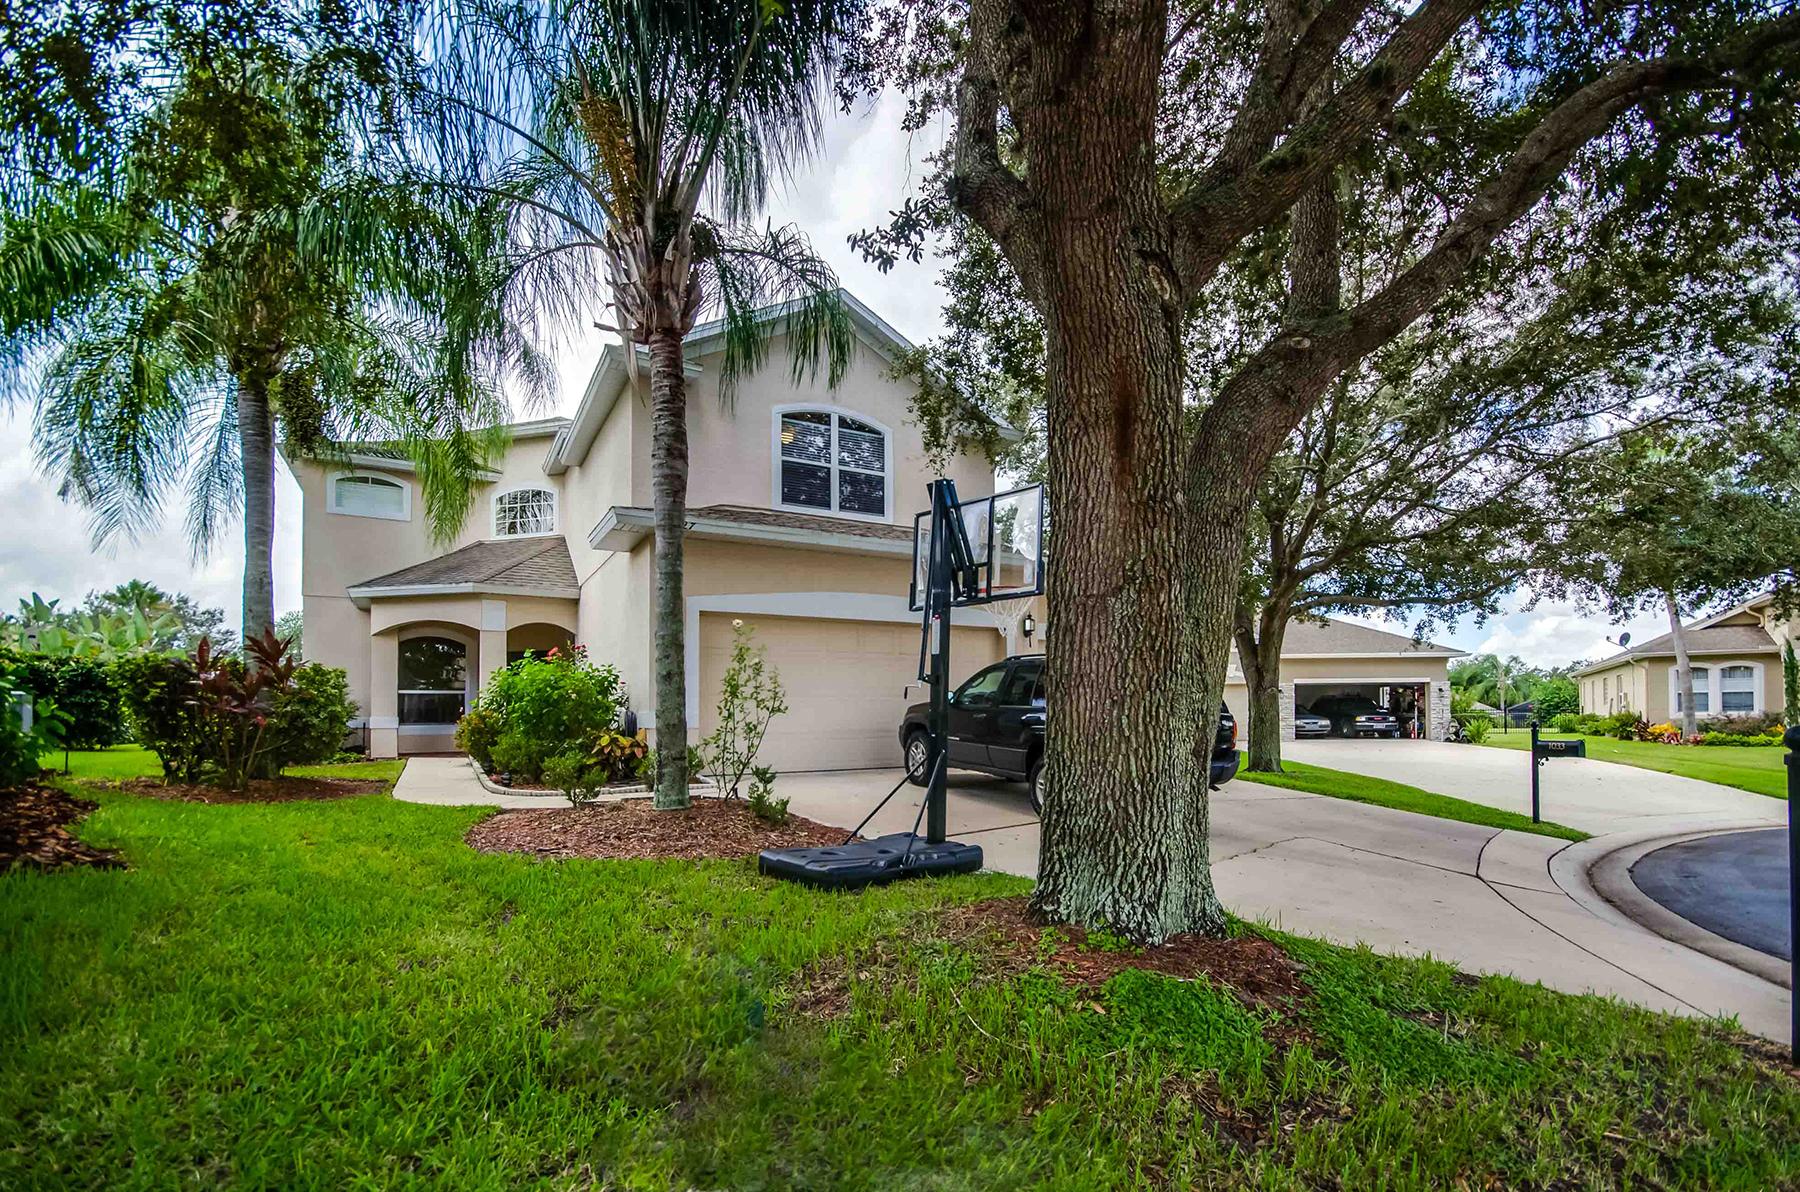 Single Family Home for Sale at LAKE MARY - HEATHROW 1027 Ridgemount Pl Lake Mary, Florida, 32746 United States